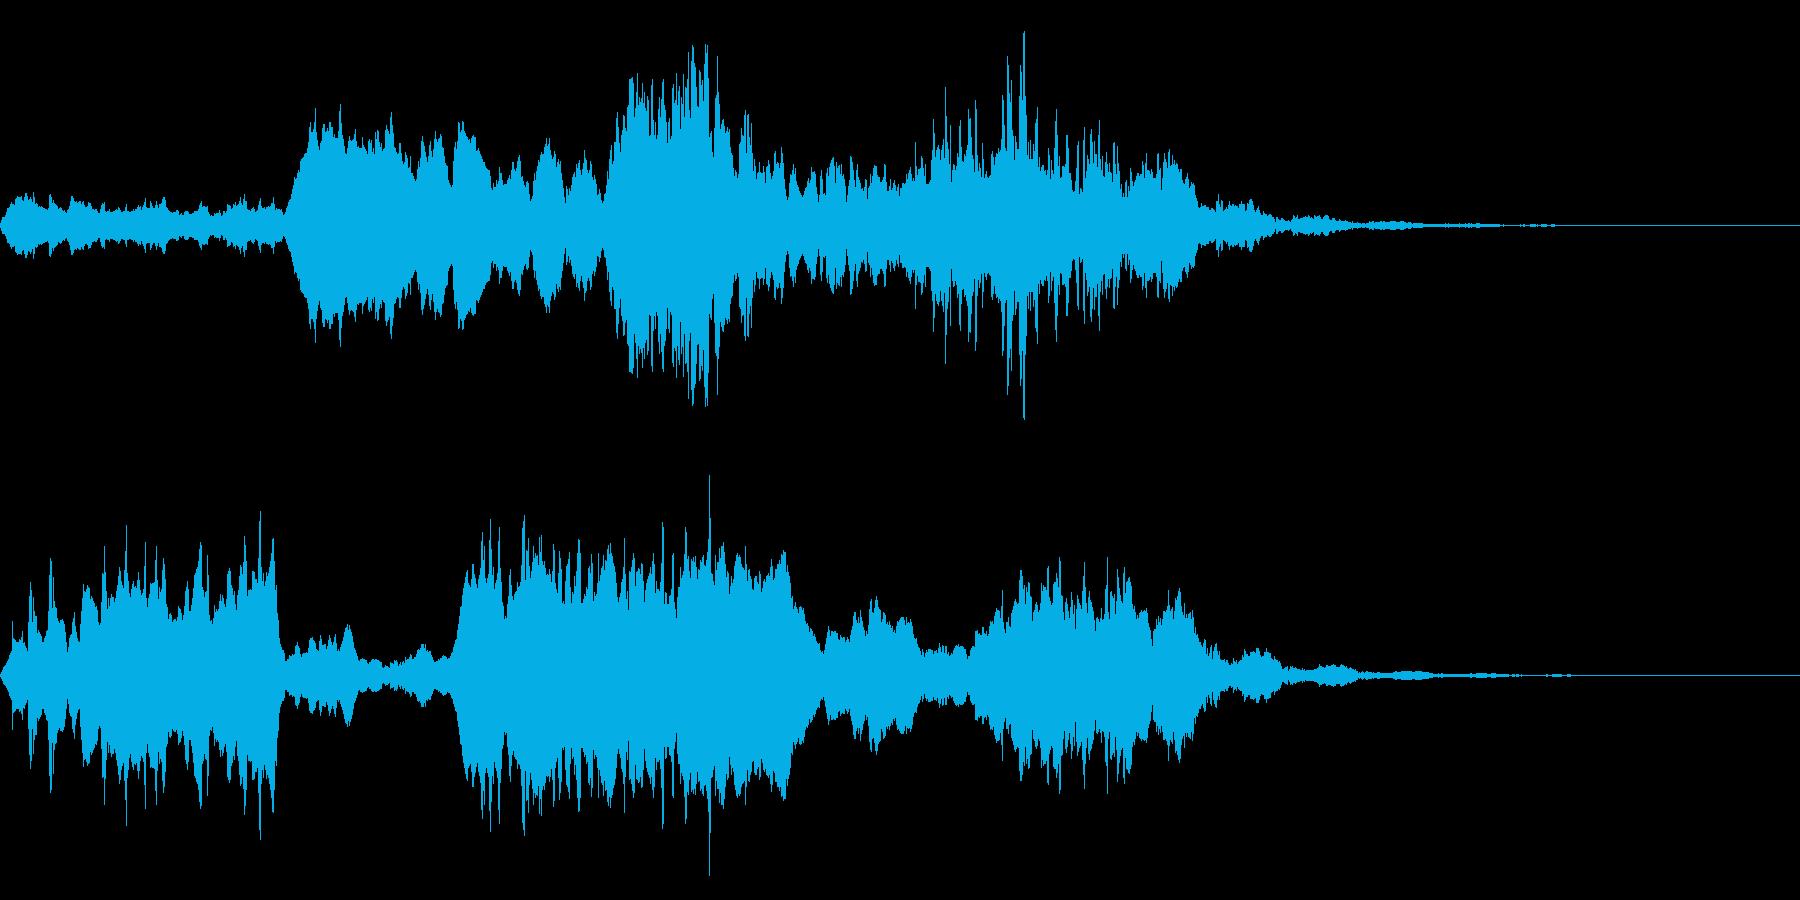 【SE 効果音】奇妙な音8の再生済みの波形